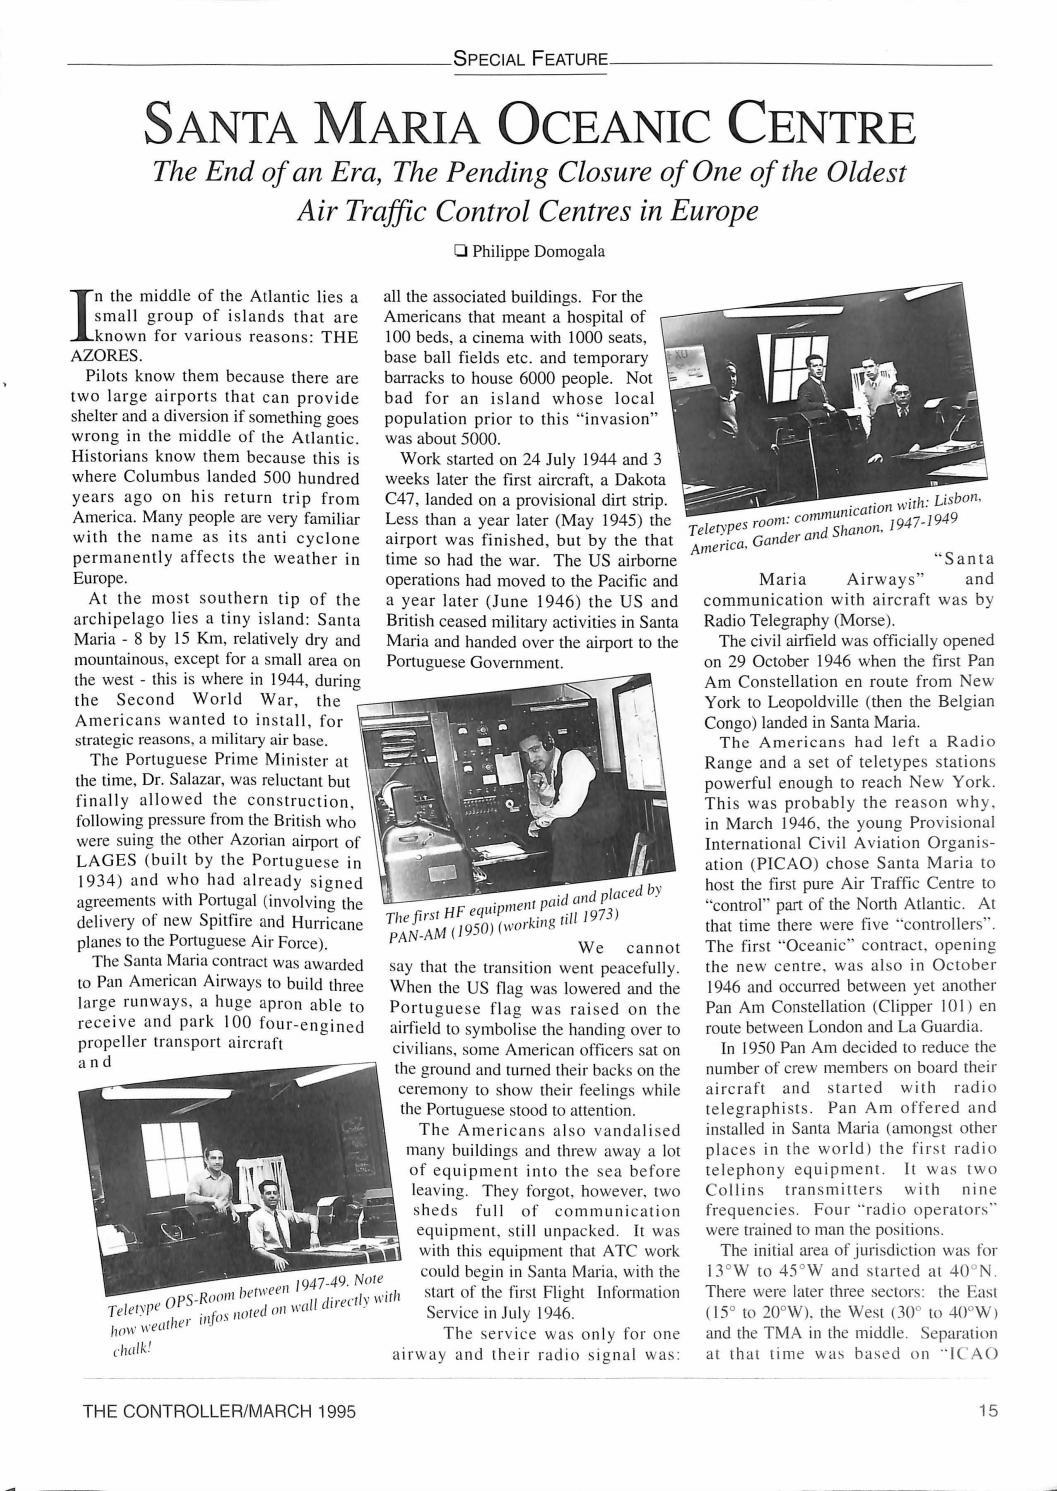 IFATCA The Controller - 1st Quarter 1995 by IFATCA - issuu